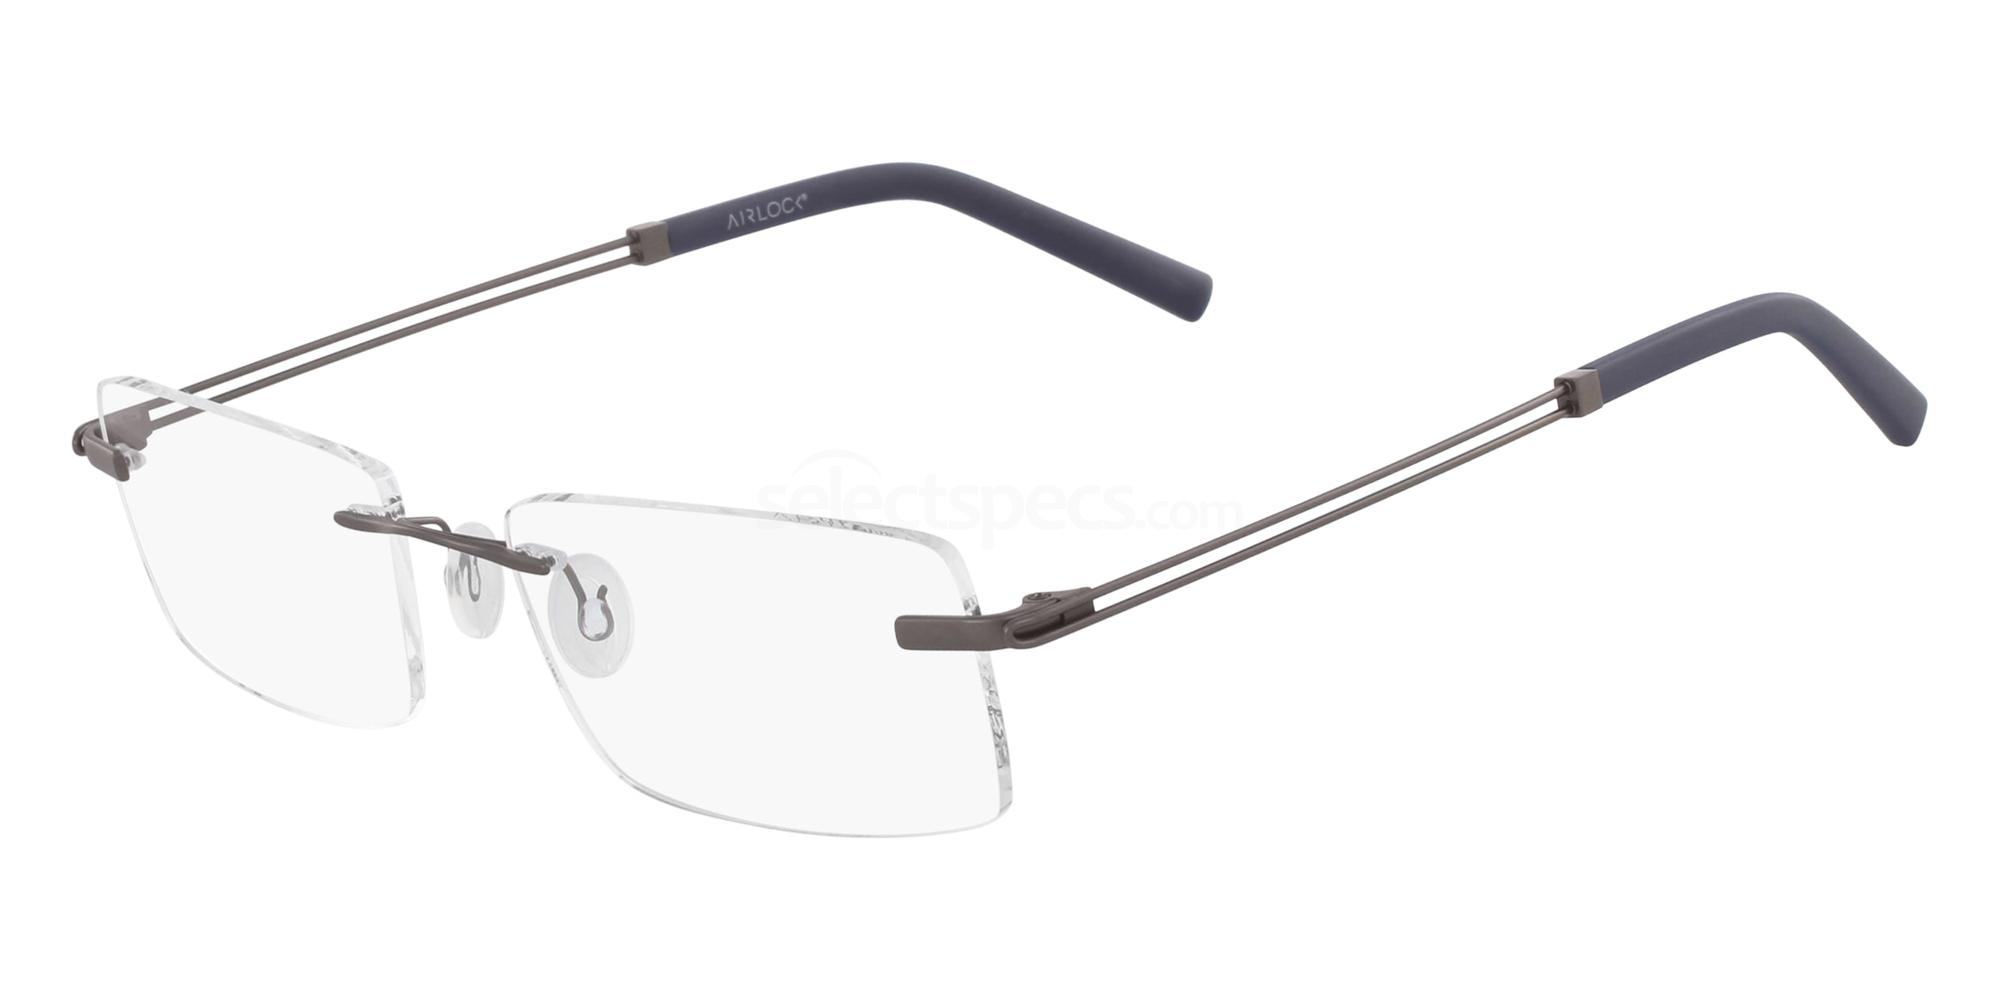 033 DIGNITY 201 Glasses, AIRLOCK